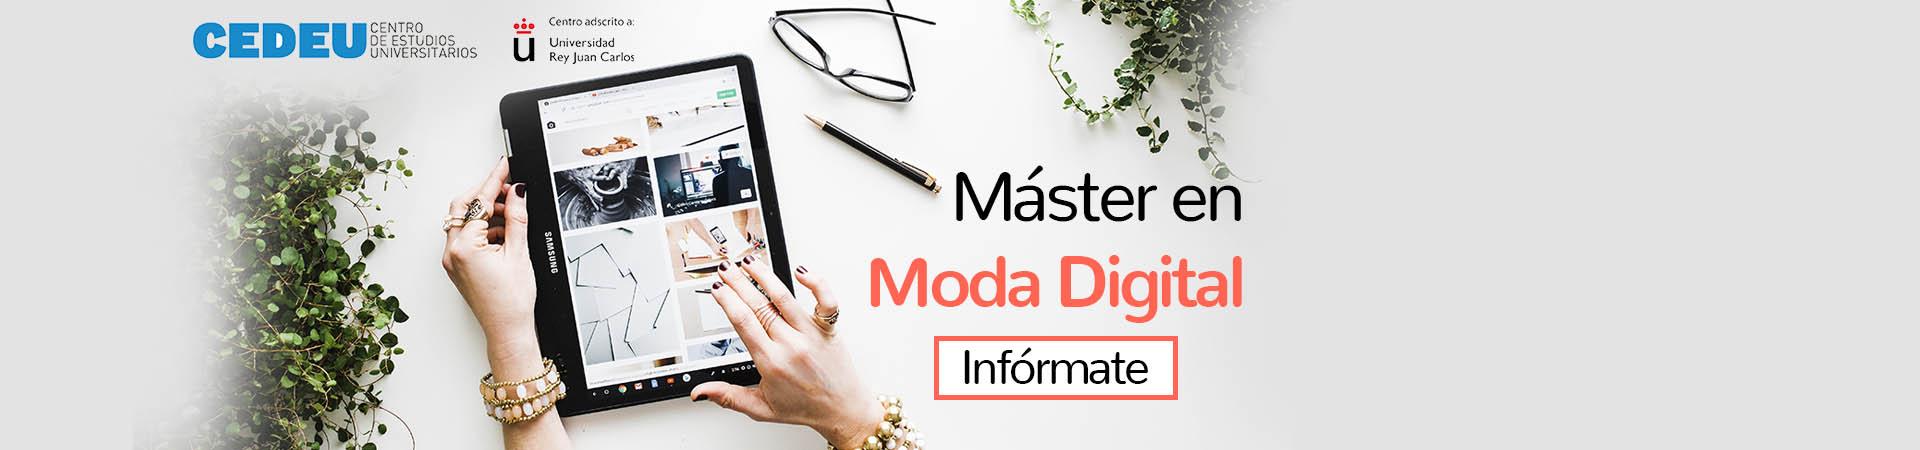 moda-digital